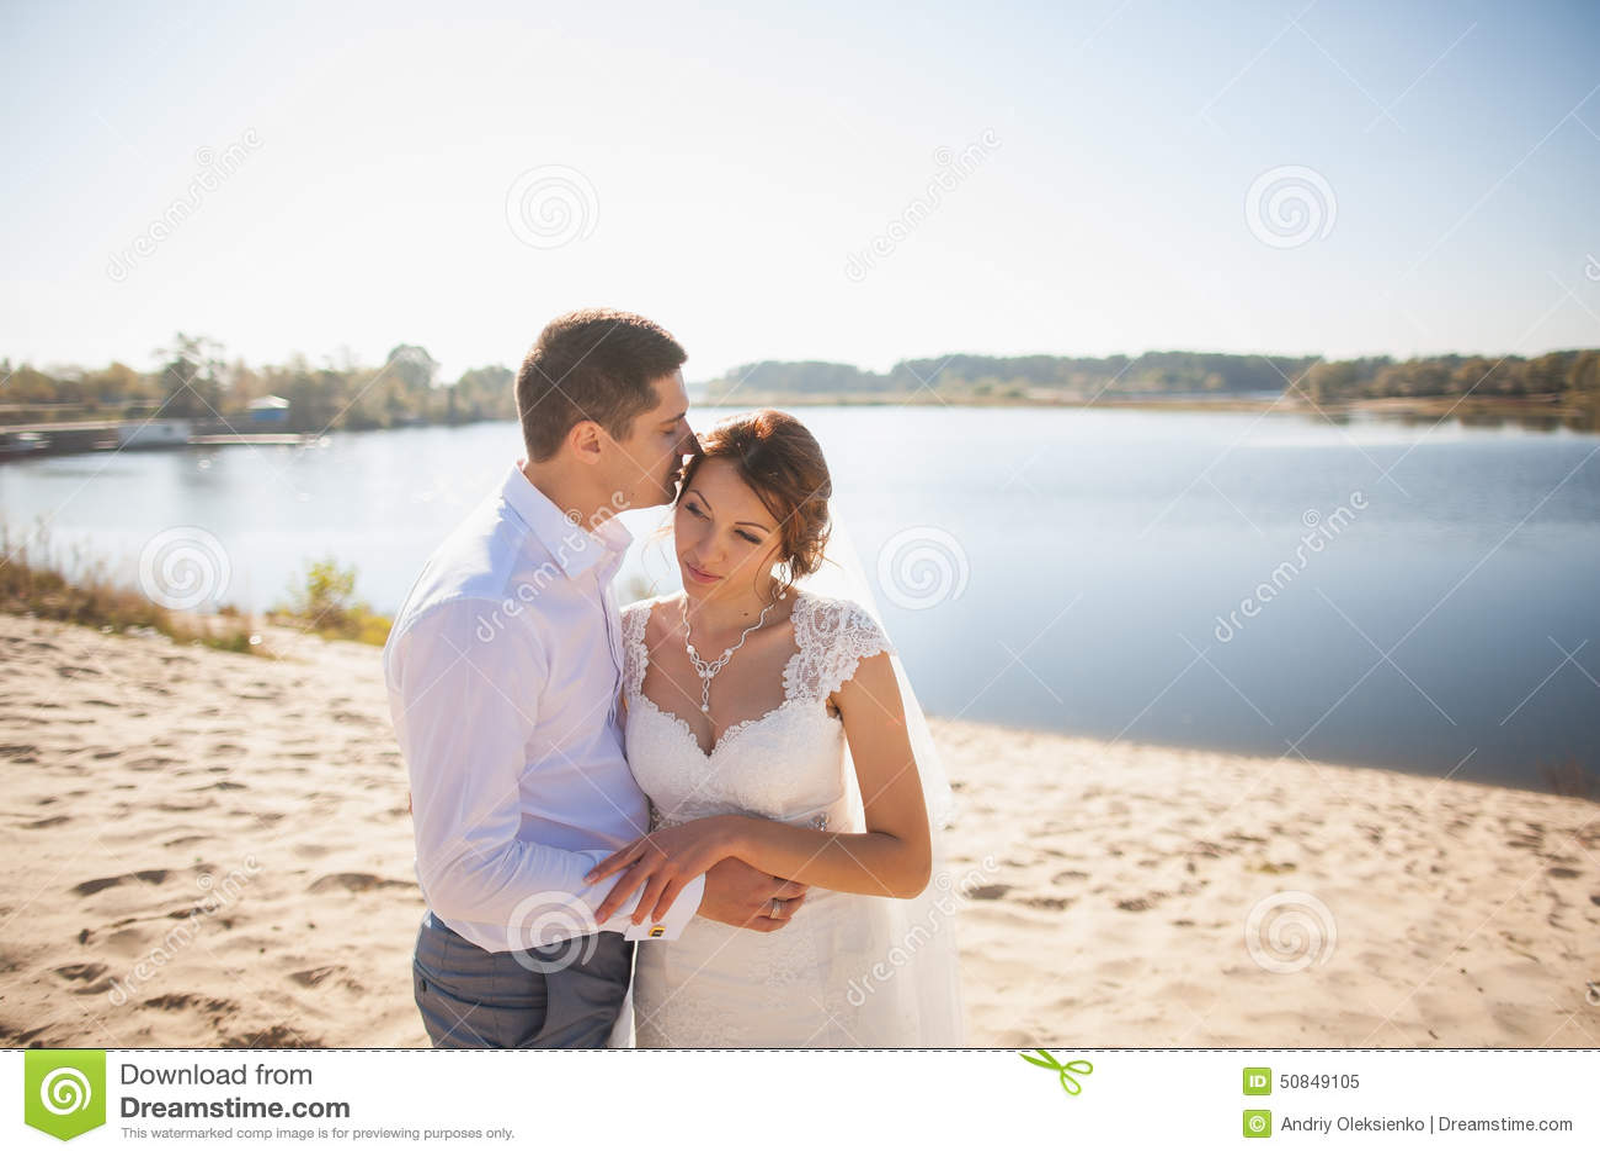 Honeymoon of just married wedding couple happy bride for Honeymoon on the beach